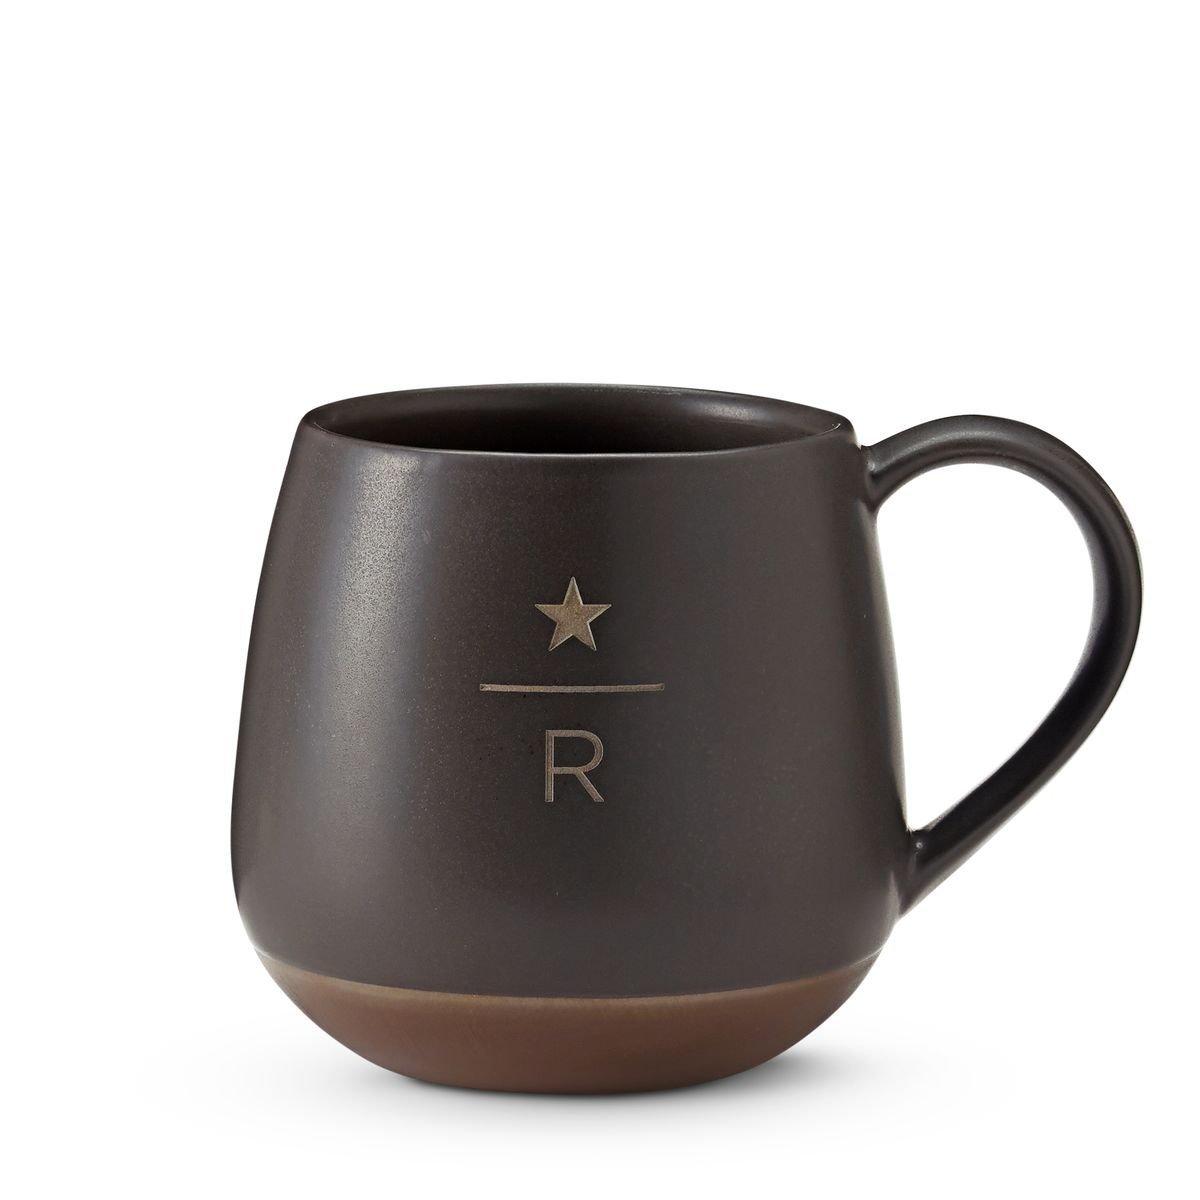 Starbucks Reserve Mug チャコール 16 fl oz スターバックス リザーブ アメリカ 限定 日本未発売